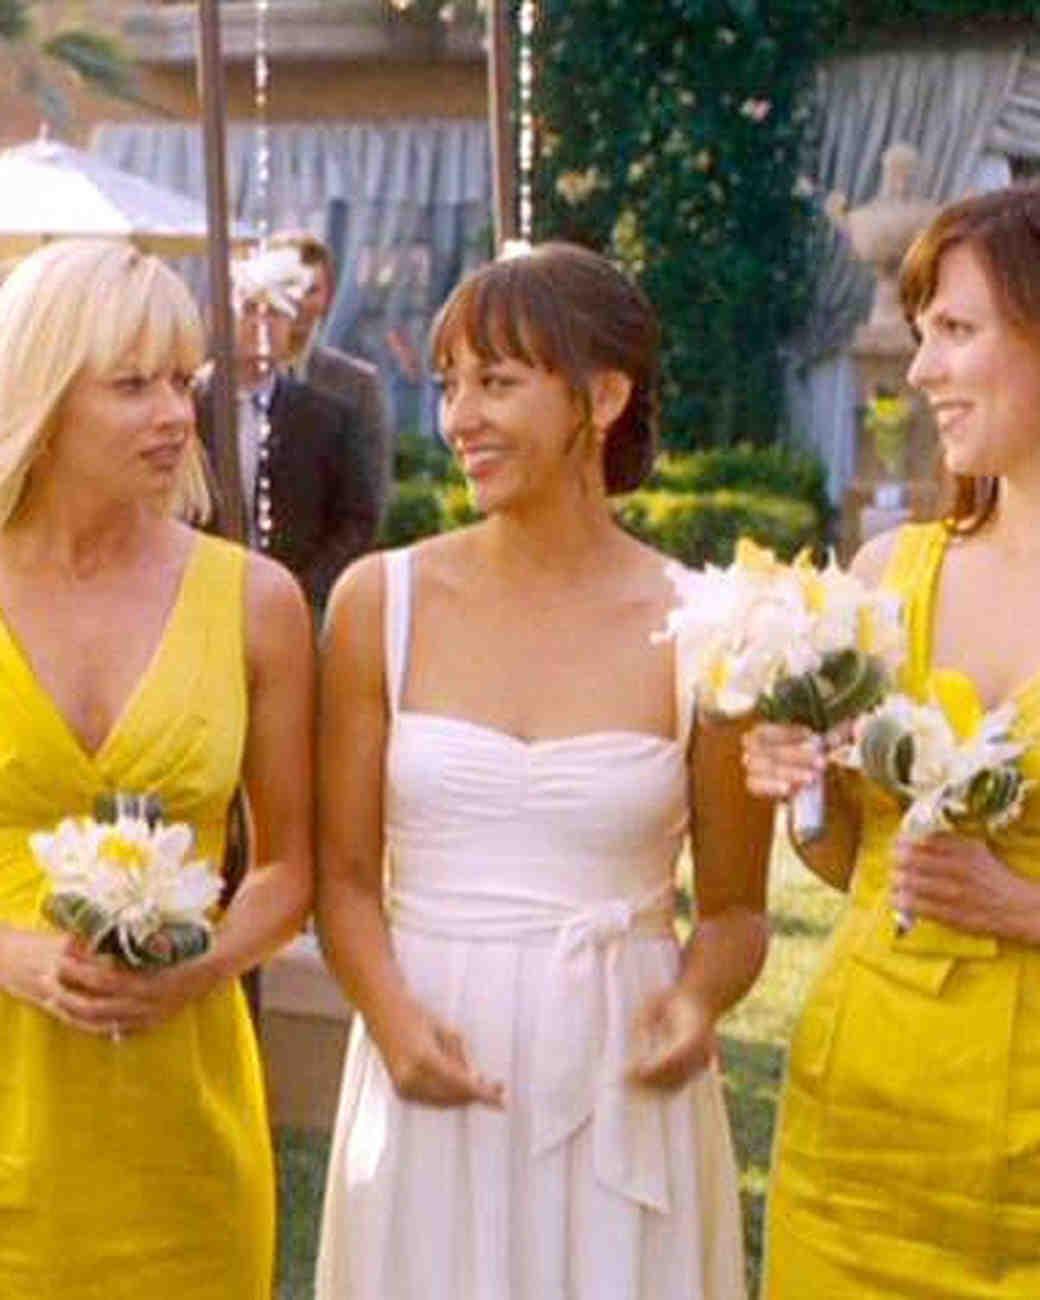 movie-wedding-dresses-i-love-you-man-rashida-jones-0316.jpg